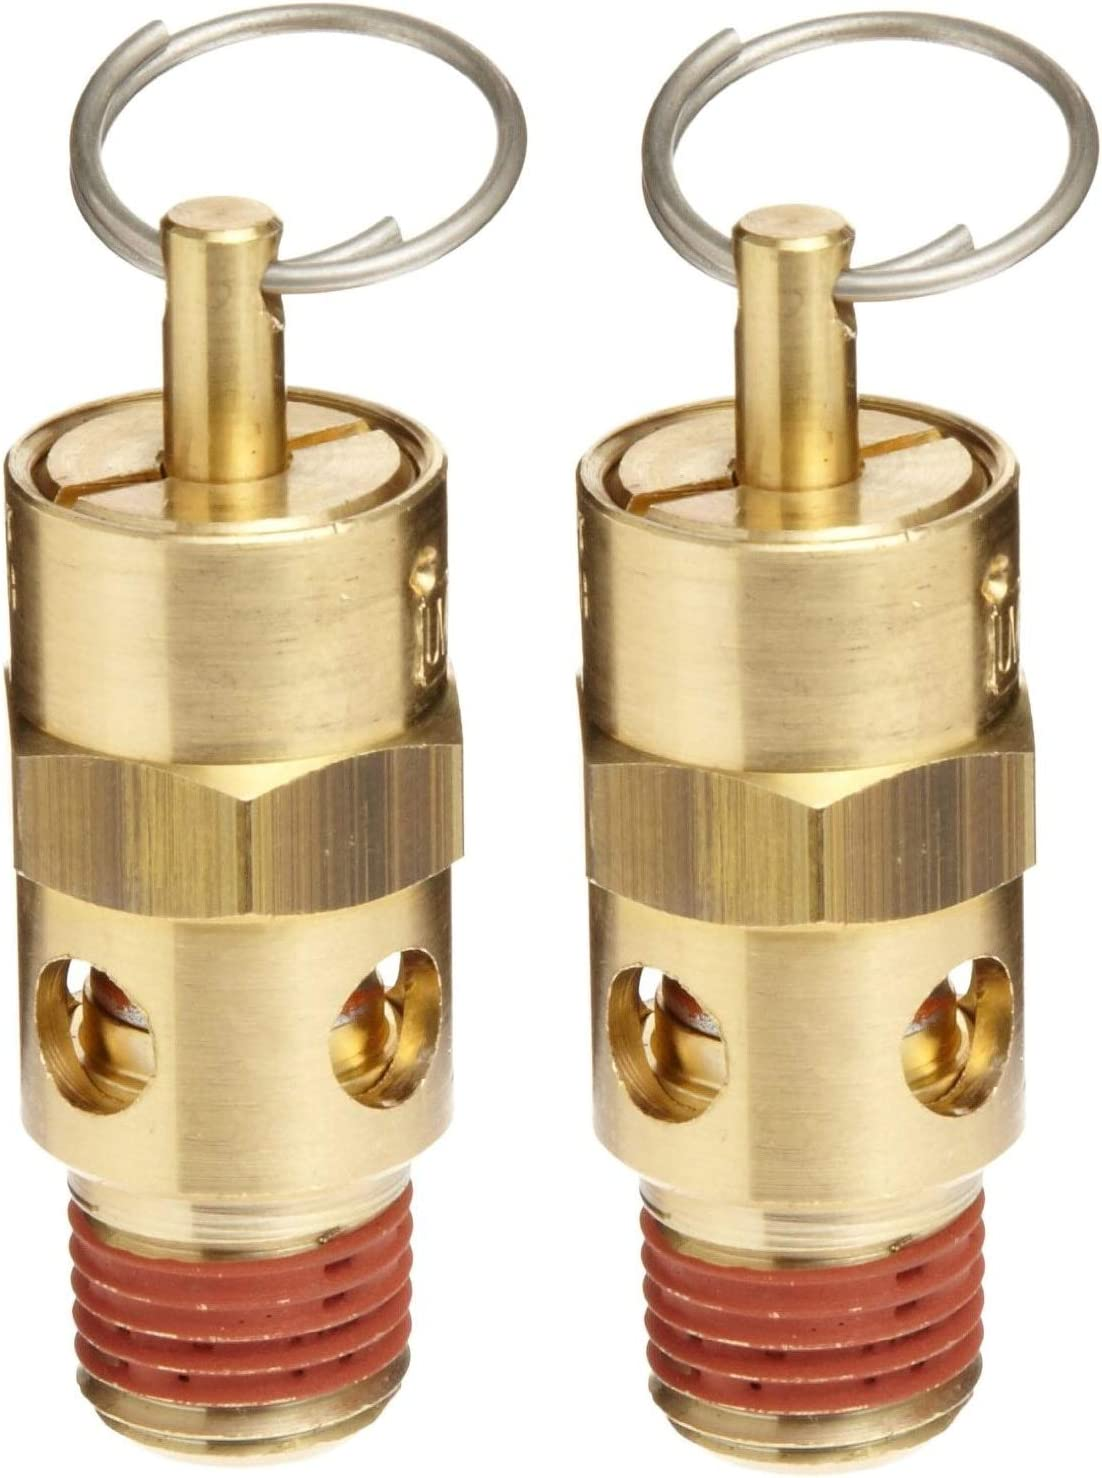 1//4 Male NPT 60 psi Set Pressure Control Devices ST Series Brass ASME Safety Valve